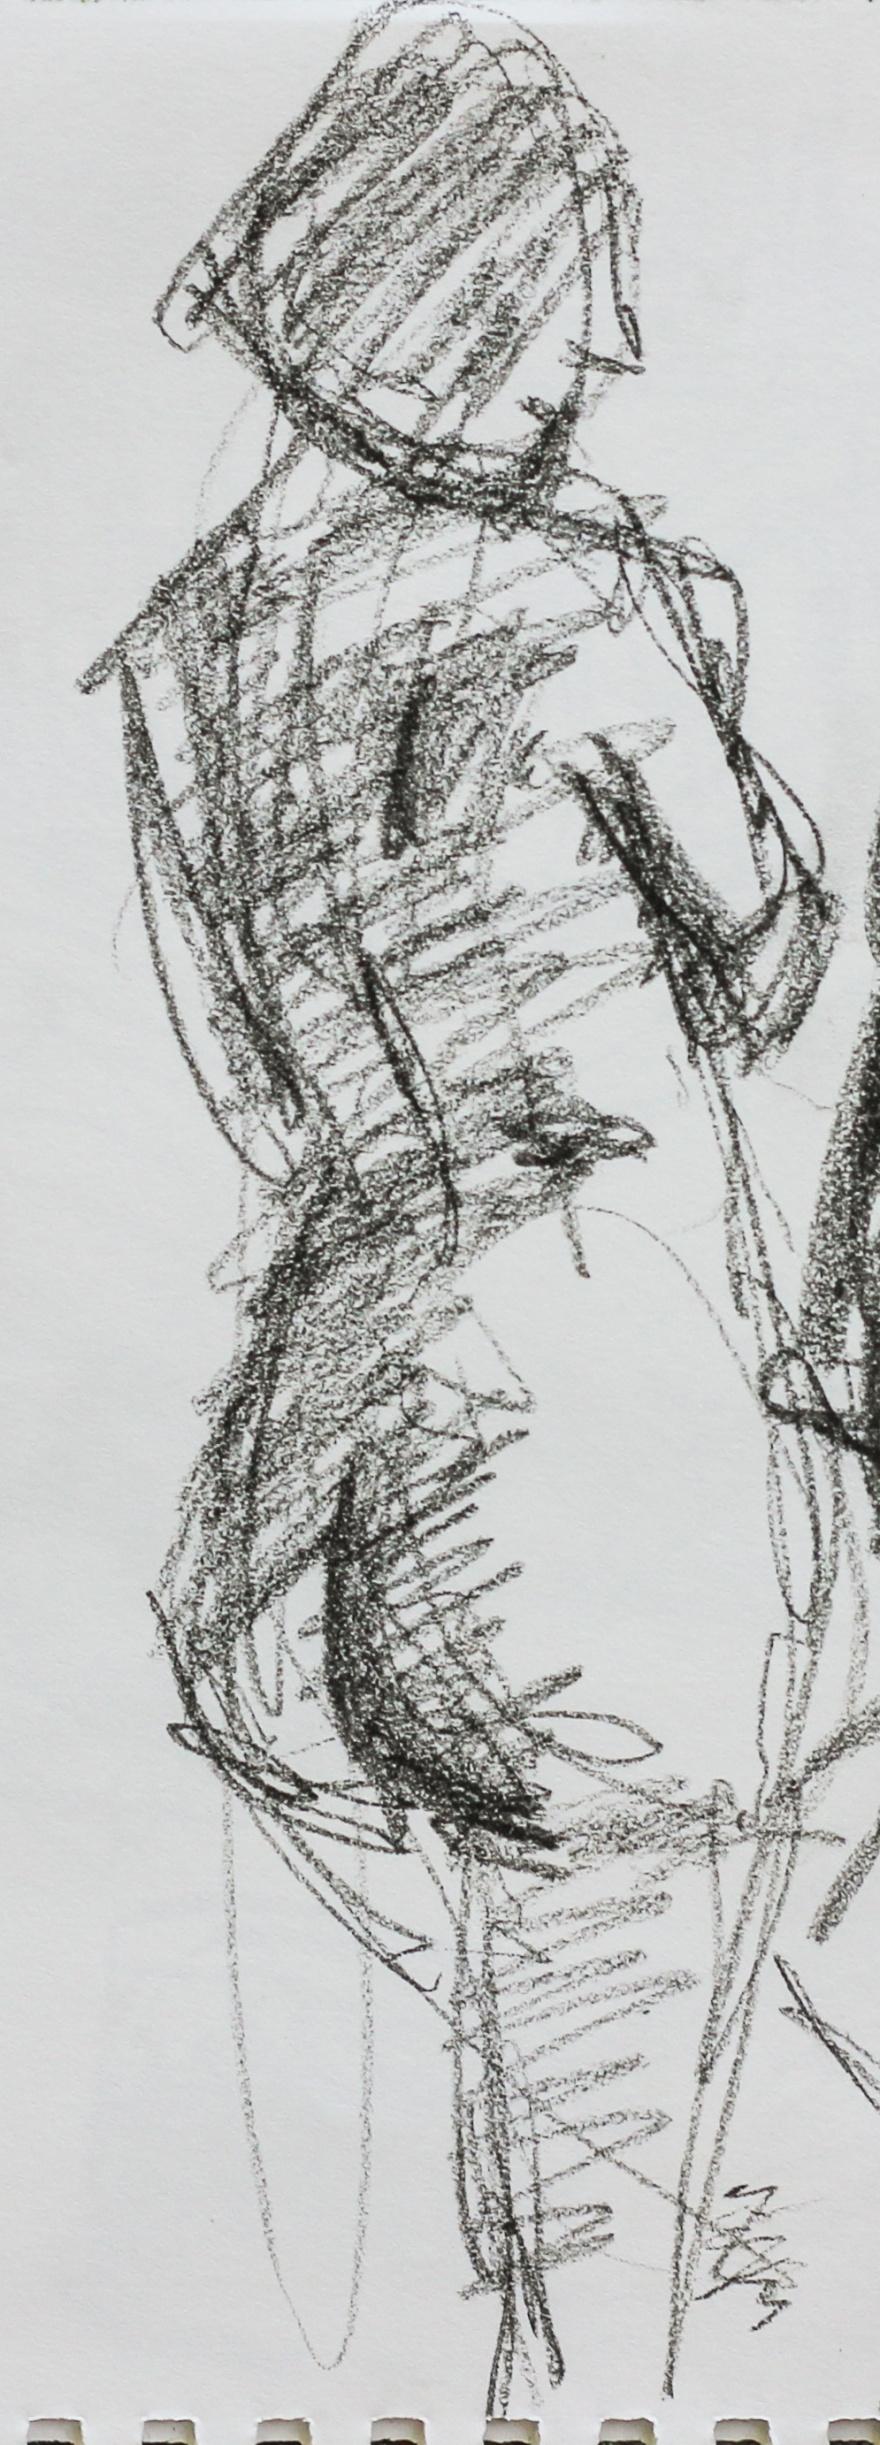 2 minute sketch